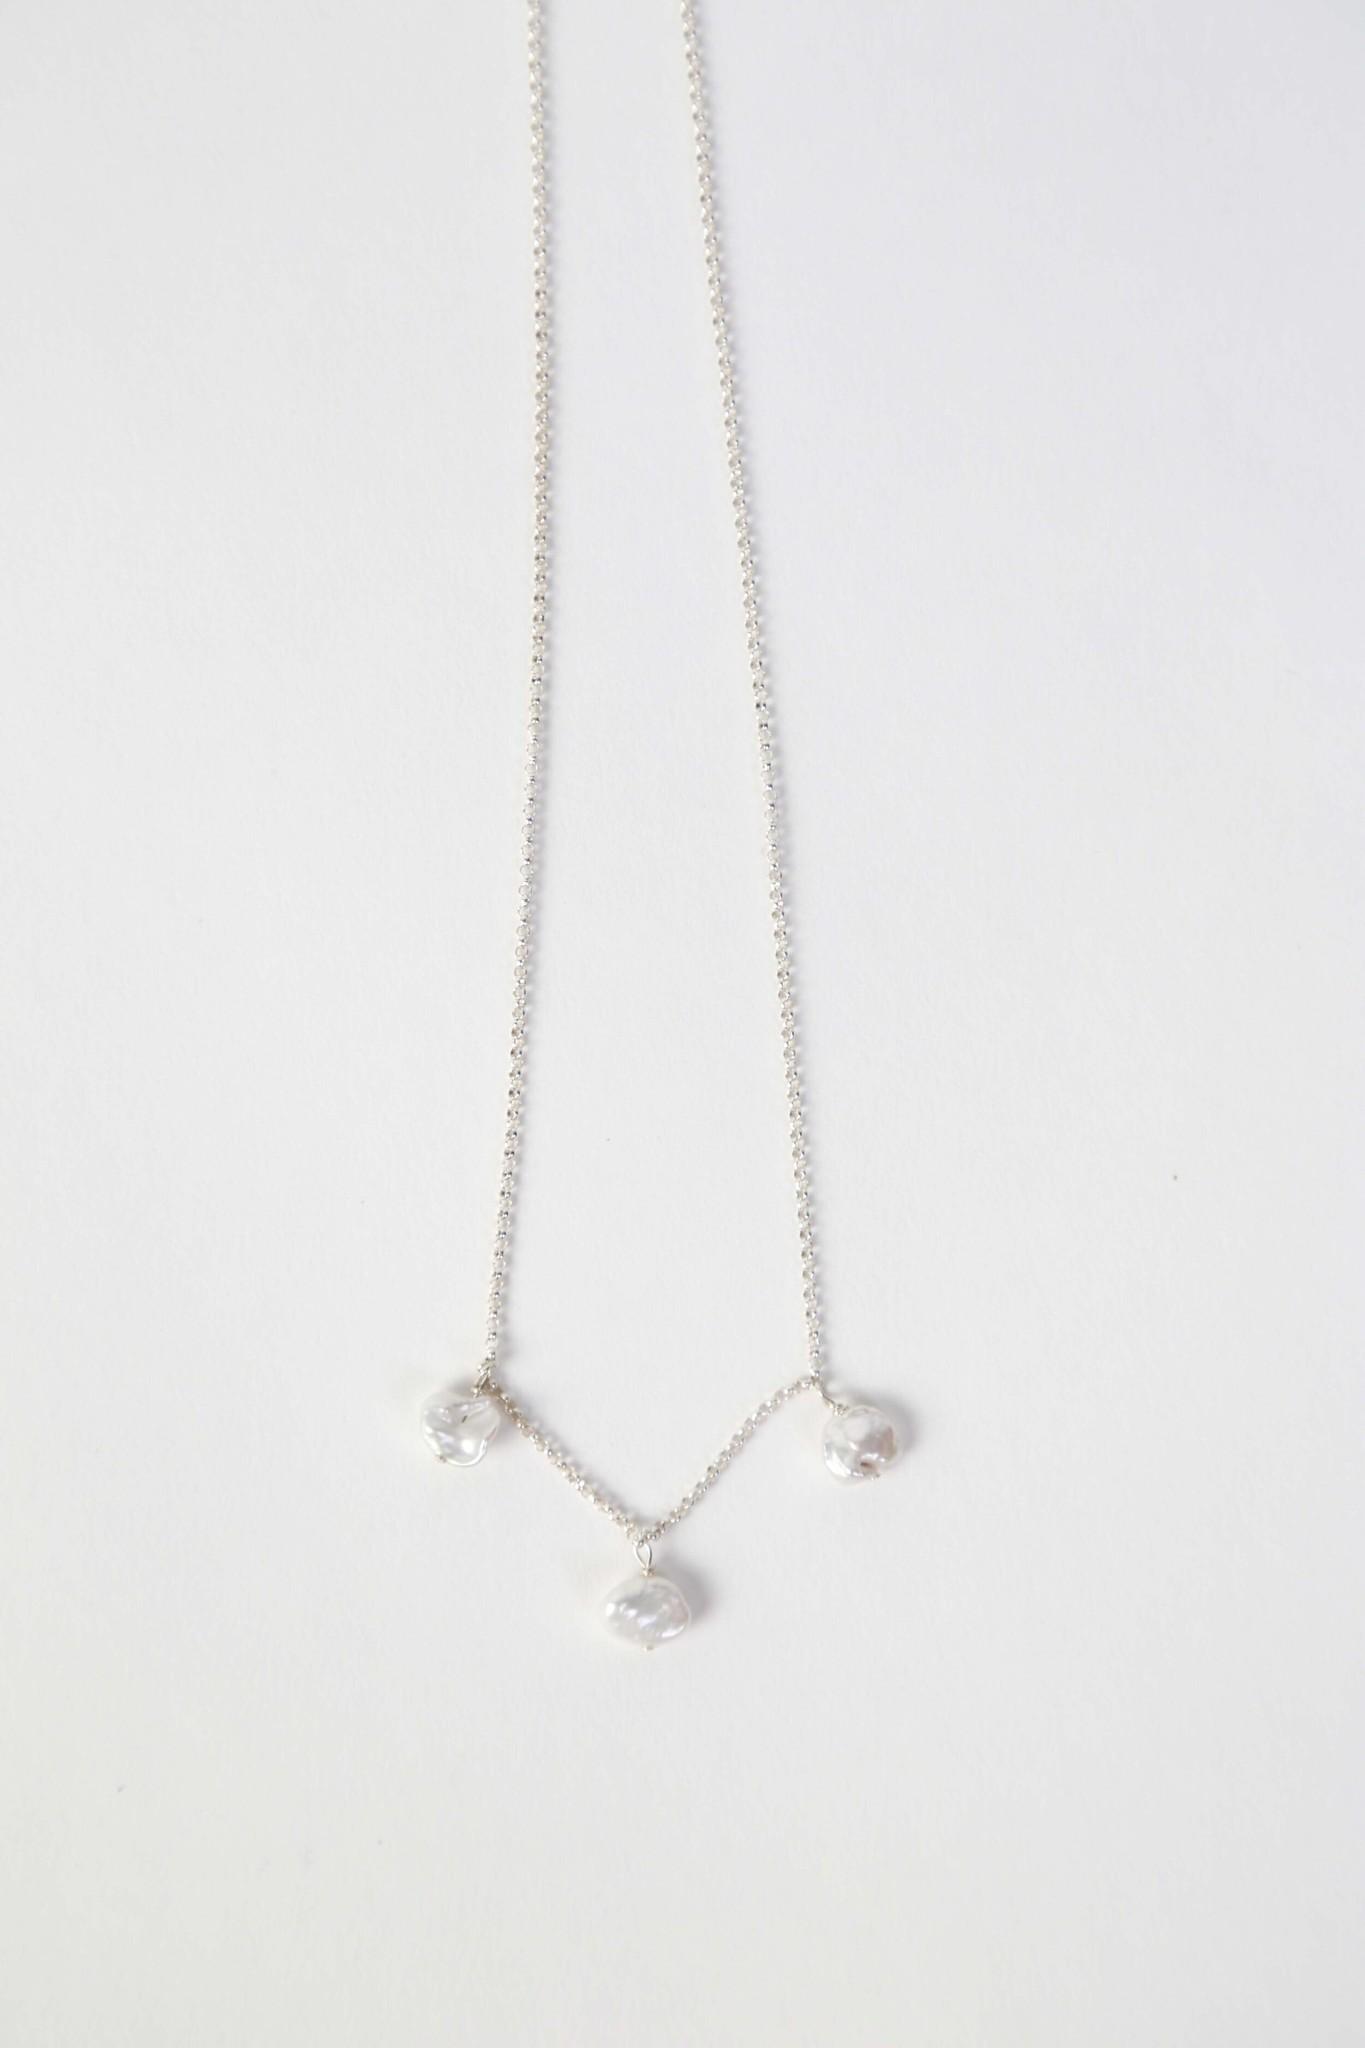 Chertova St. Agnes Necklace in Sterling Silver